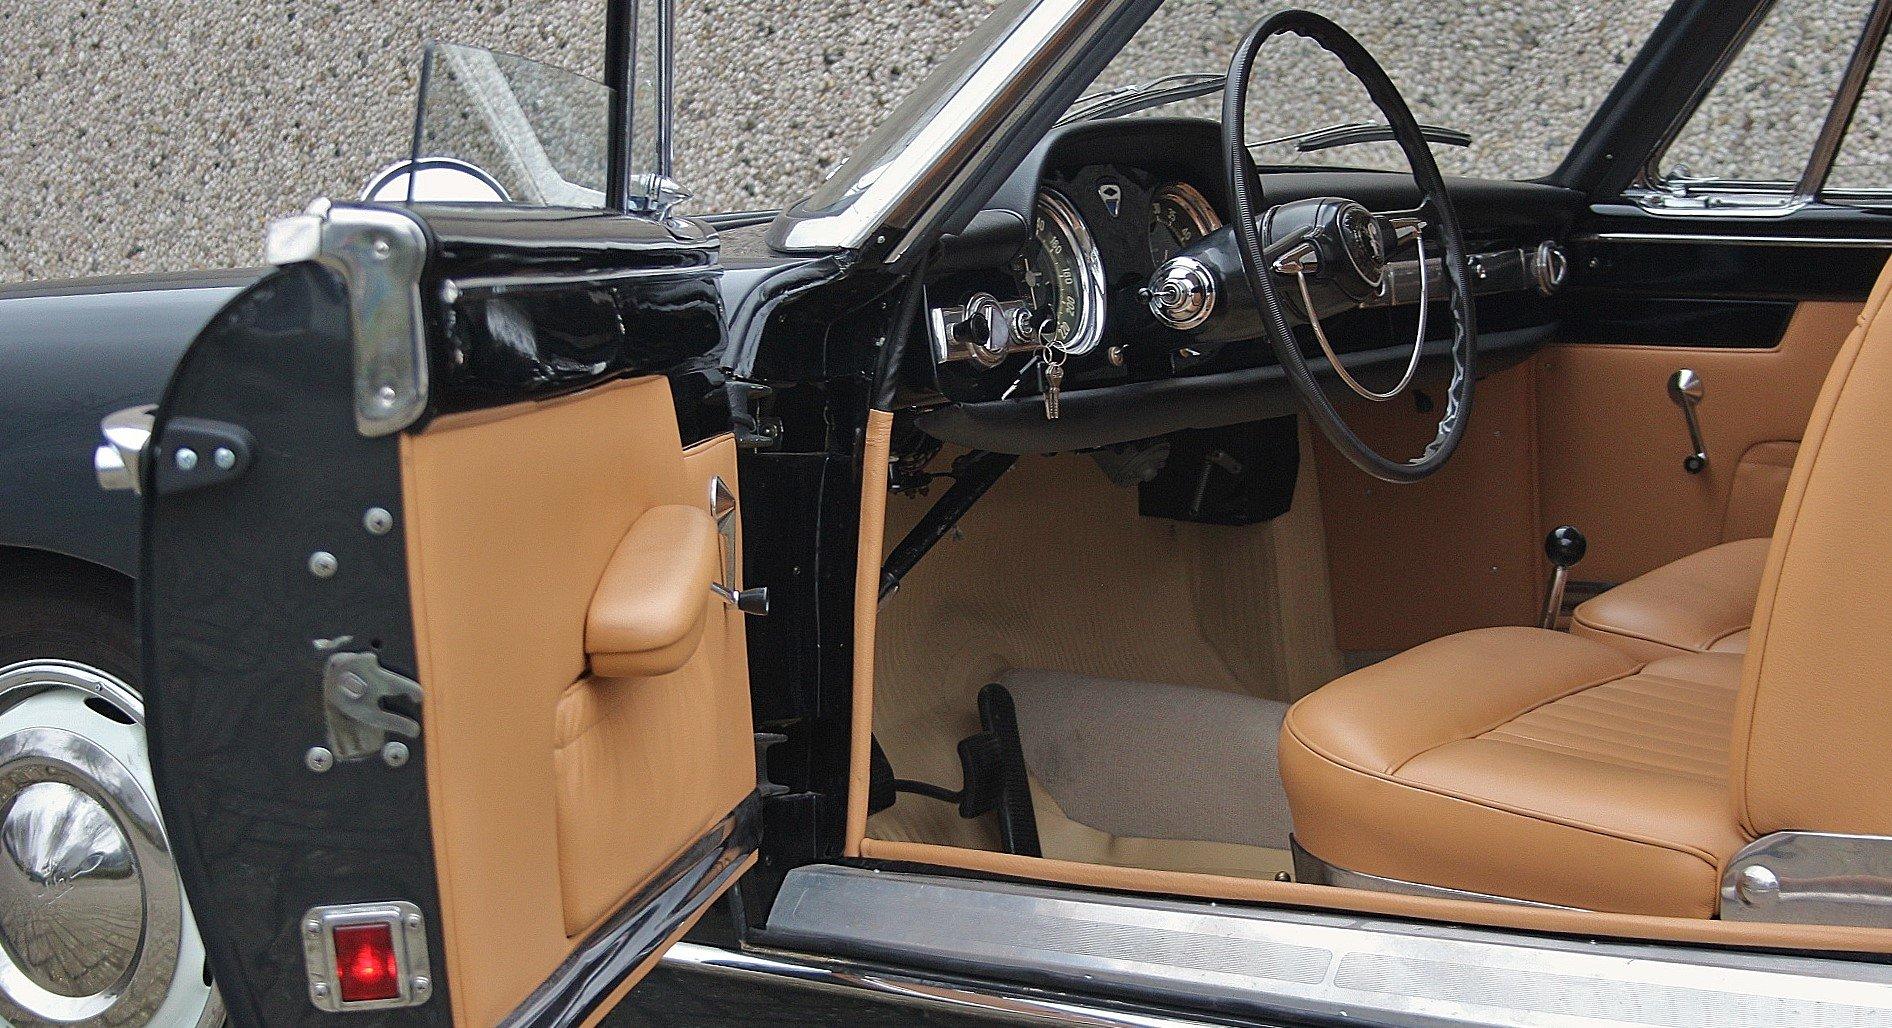 1963 Lancia Flaminia Pininfarina Coupe 2.5 For Sale (picture 5 of 6)